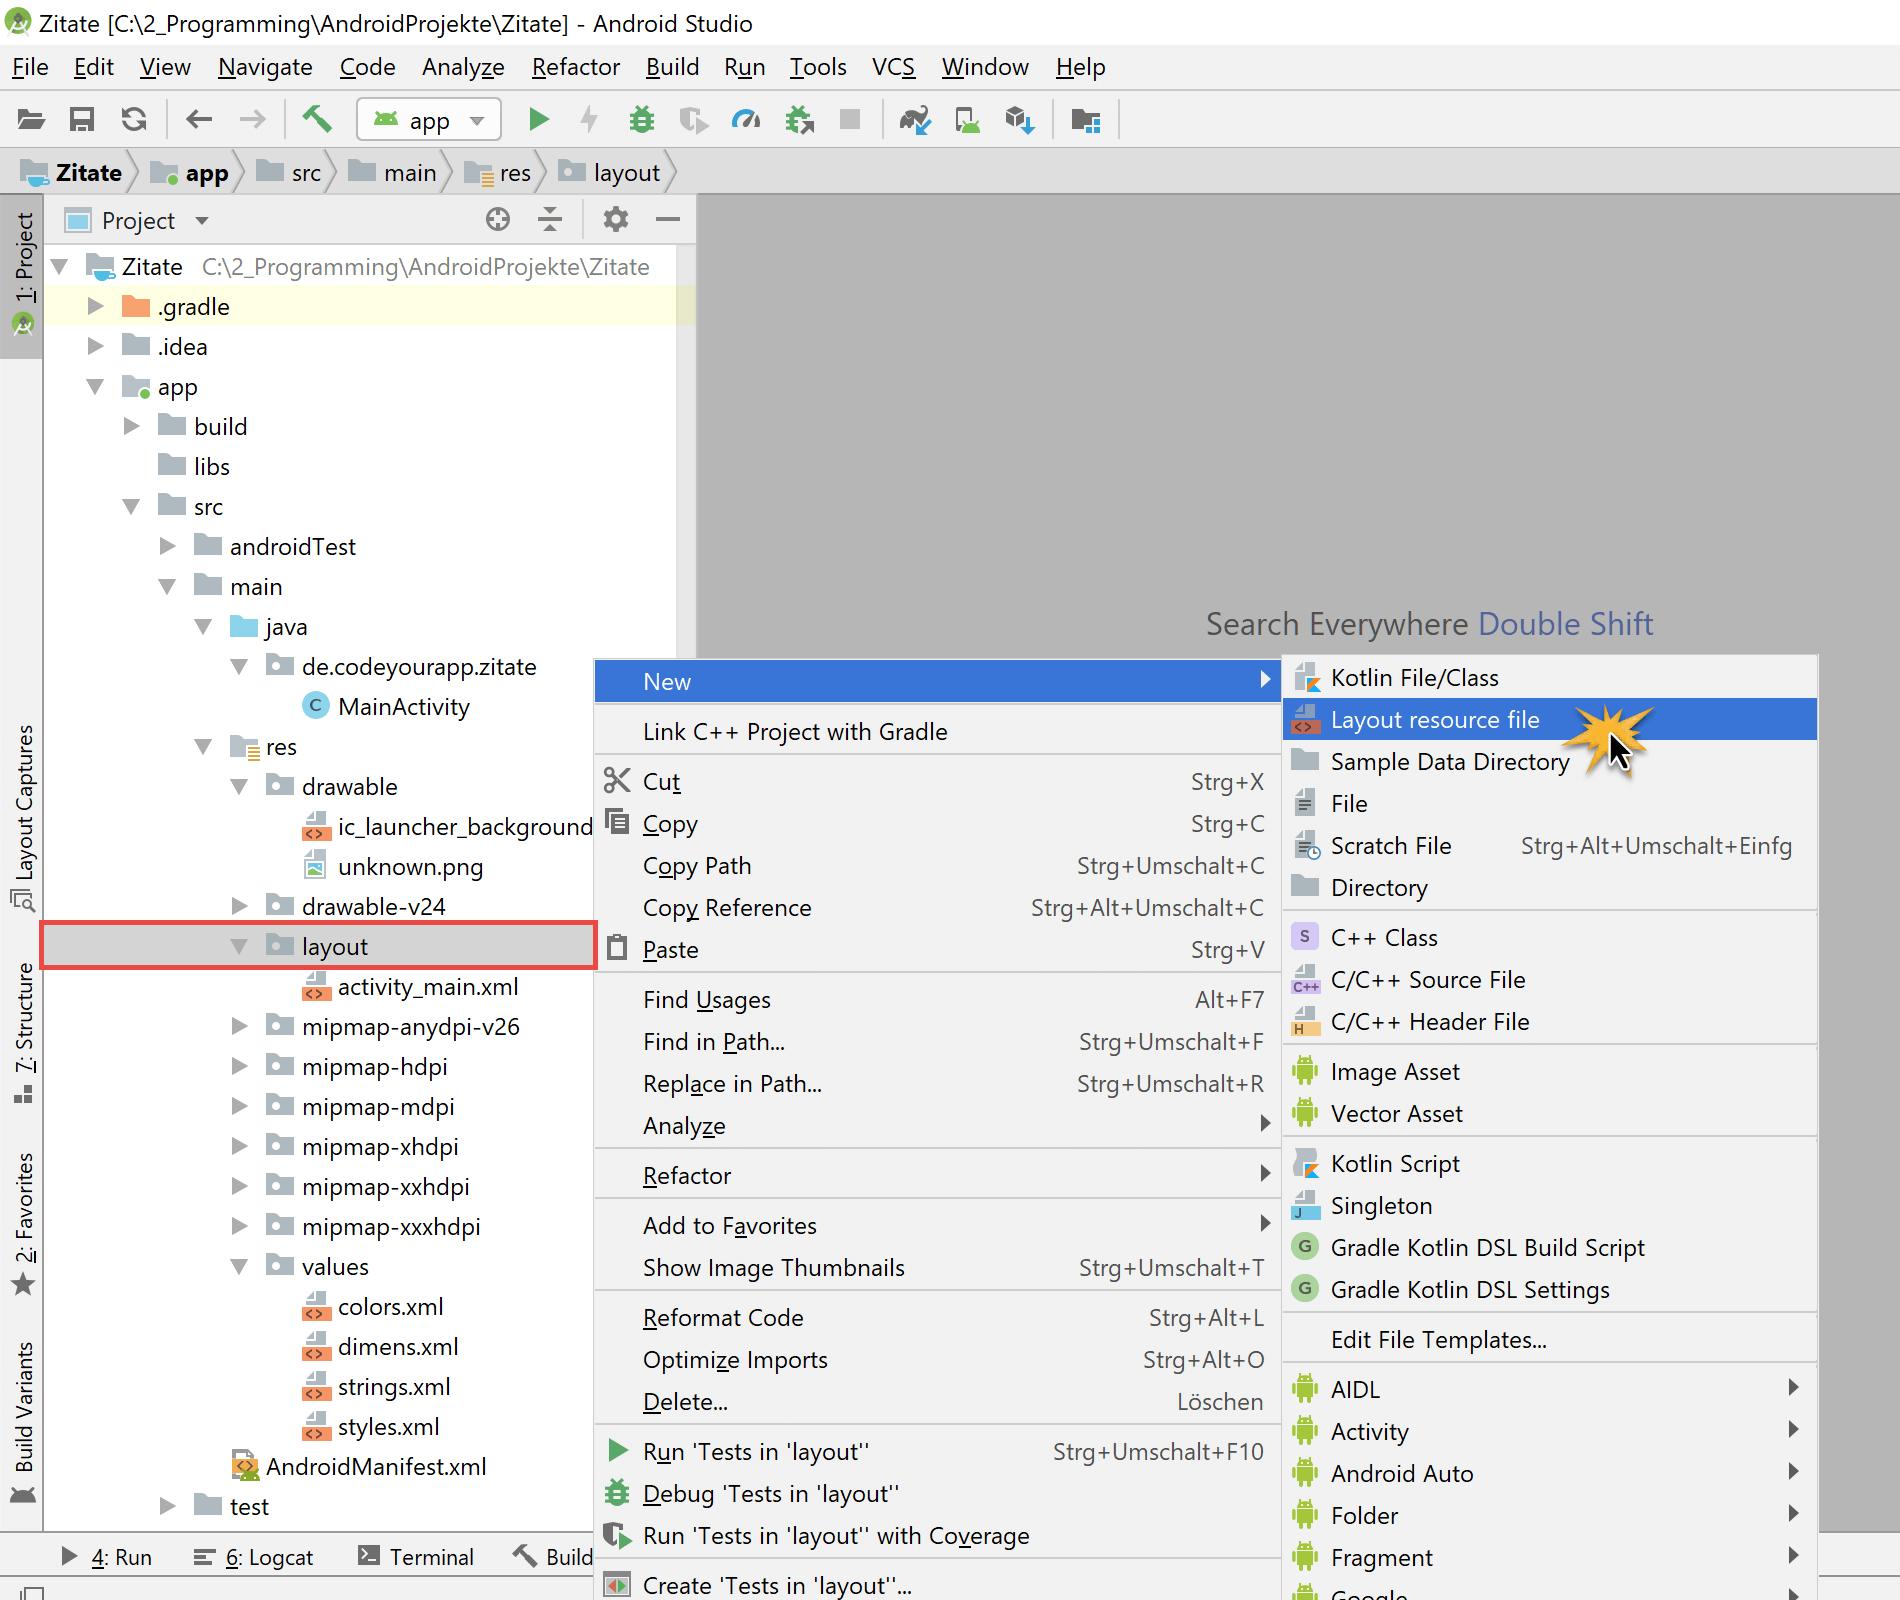 listview_new_xml_layout